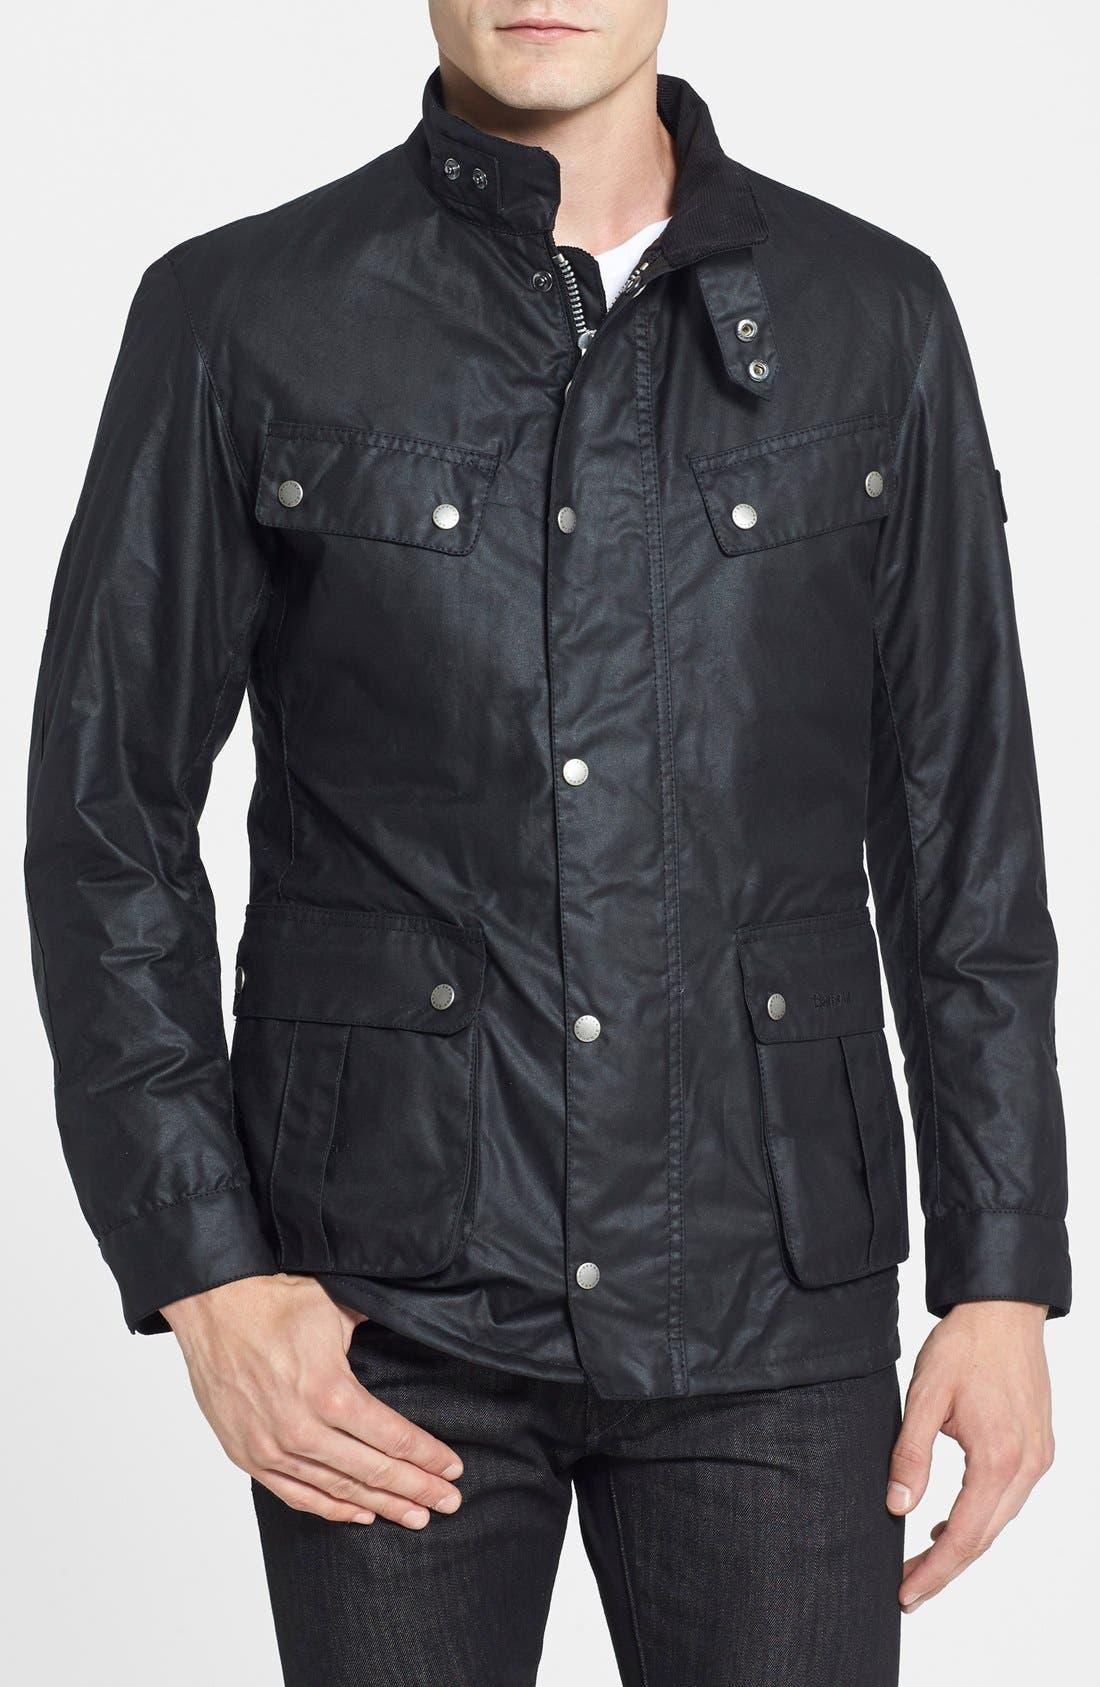 Alternate Image 1 Selected - Barbour 'Duke' Regular Fit Waterproof Waxed Cotton Jacket